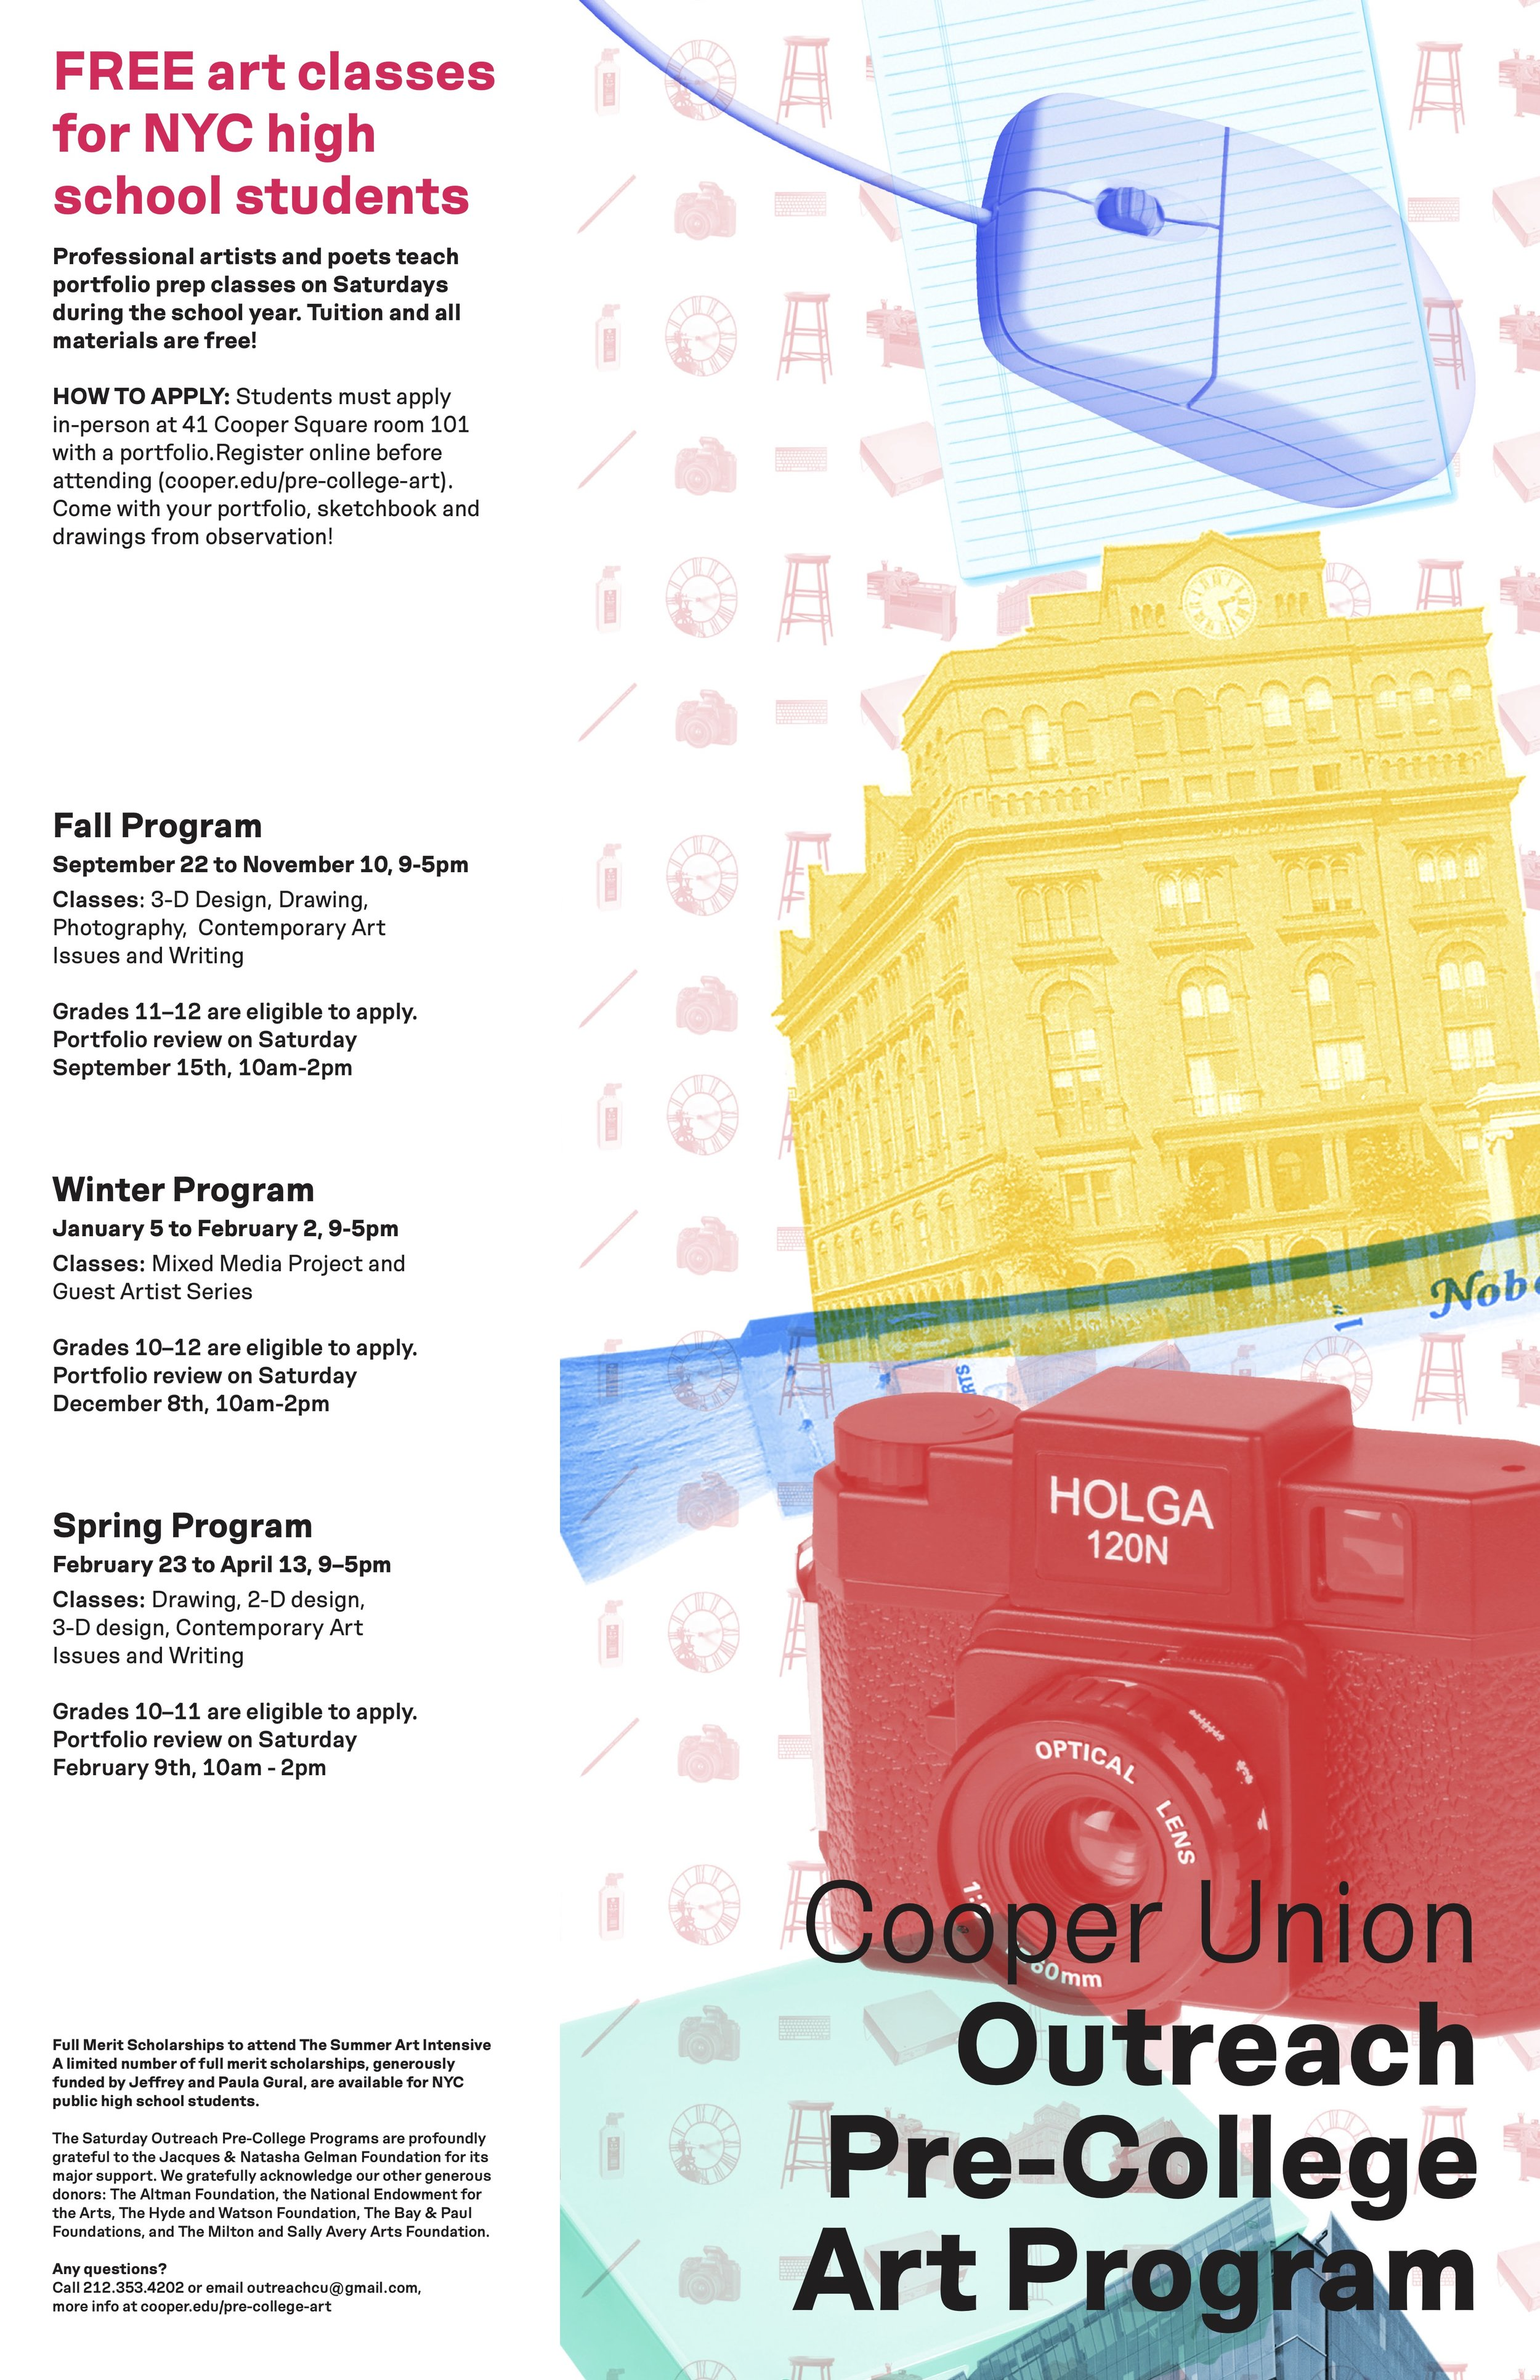 CUSAI Branding-Outreach-Poster.jpg